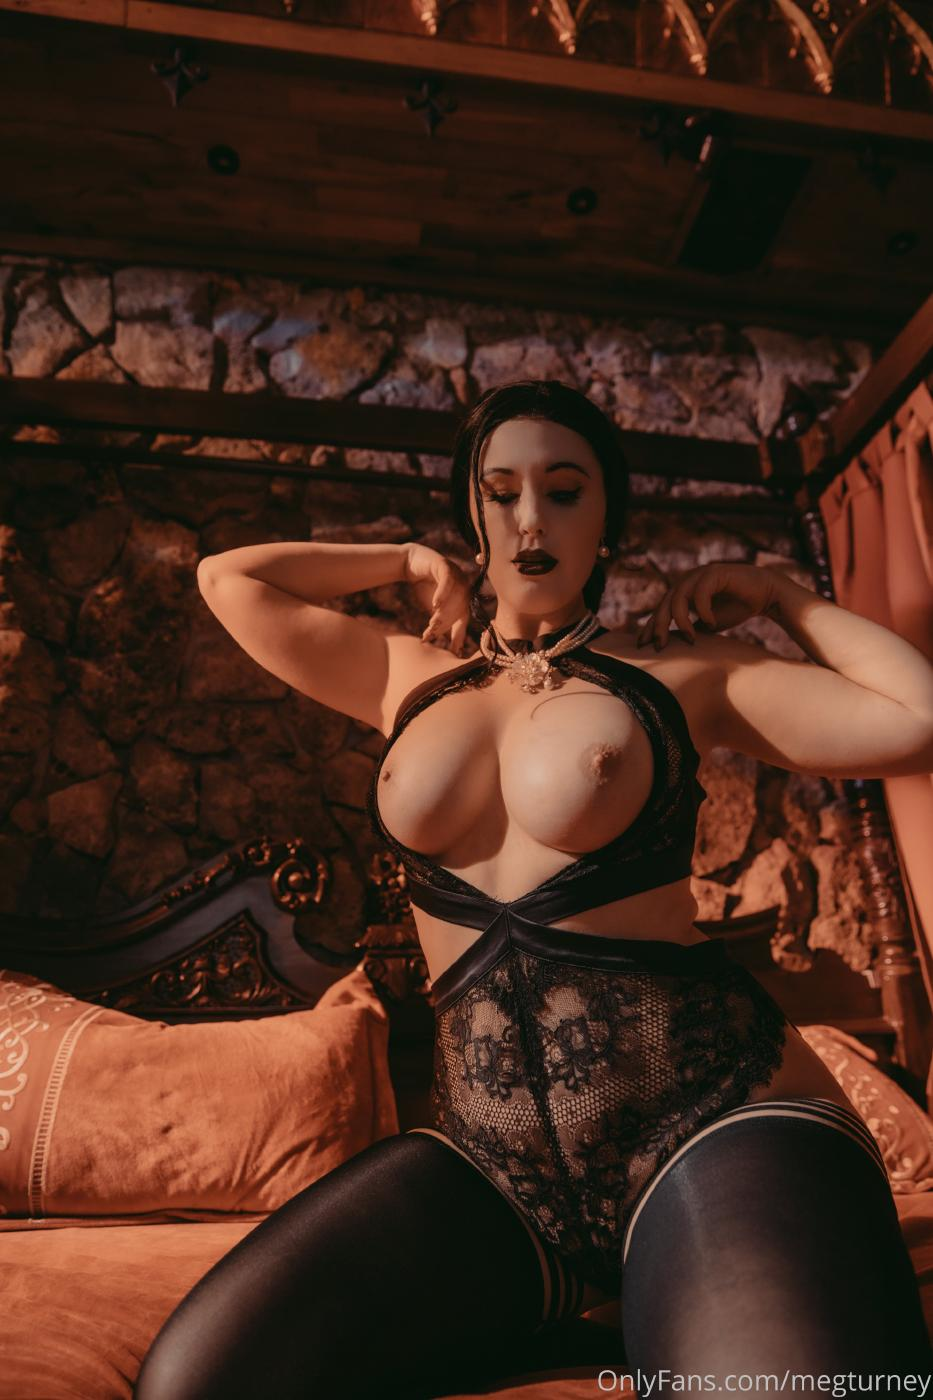 Meg Turney Lady Dimitrescu Cosplay Onlyfans Set Leaked 0002